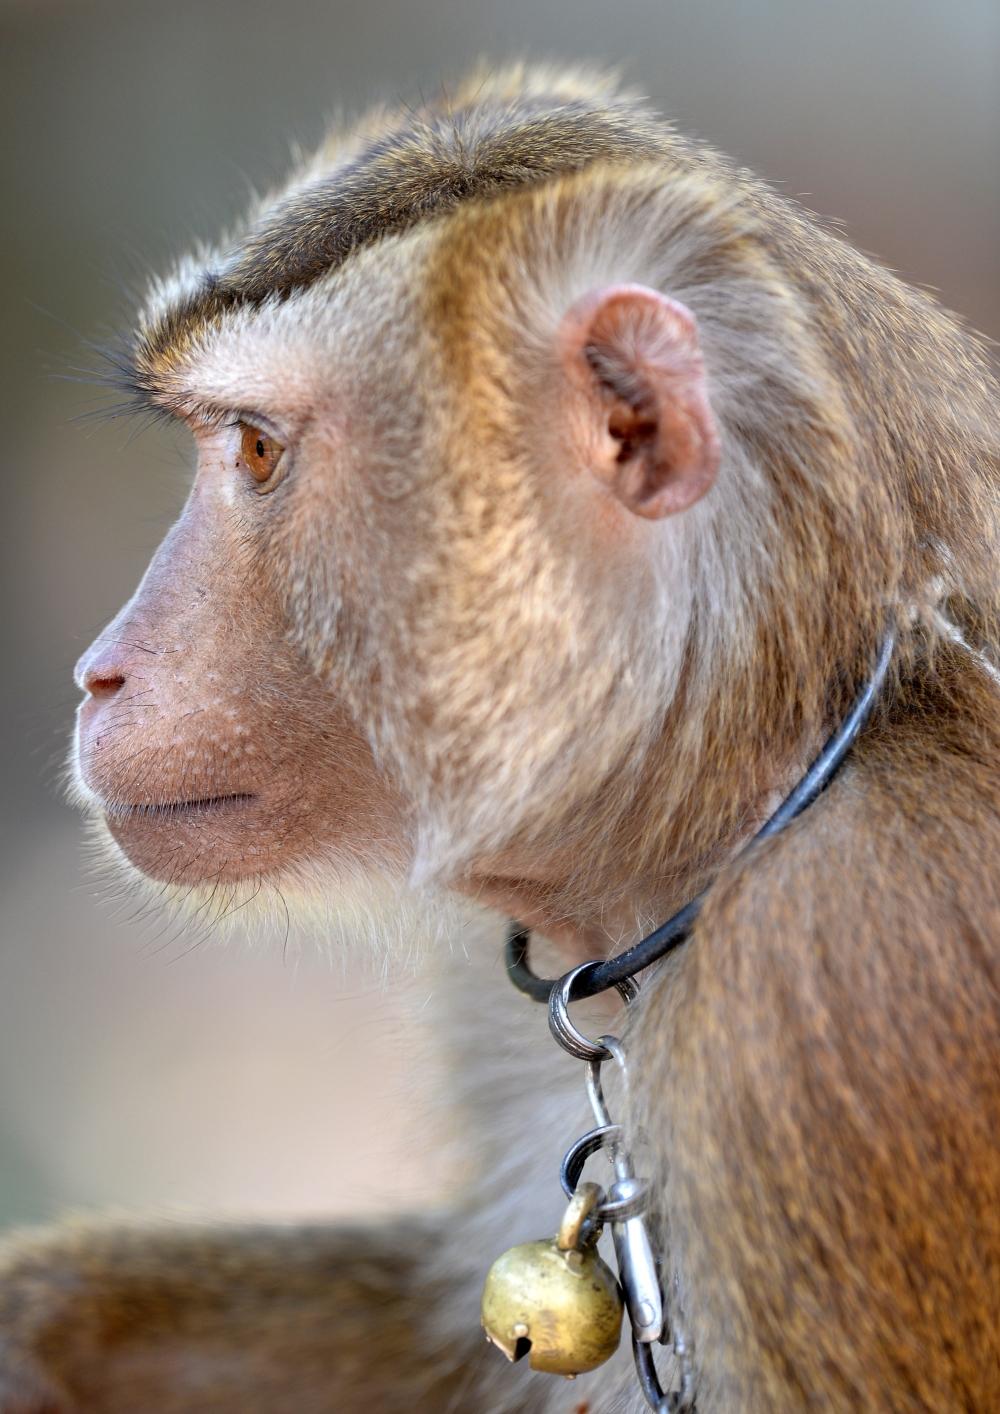 Tayland'ın köle işçi maymunları 10